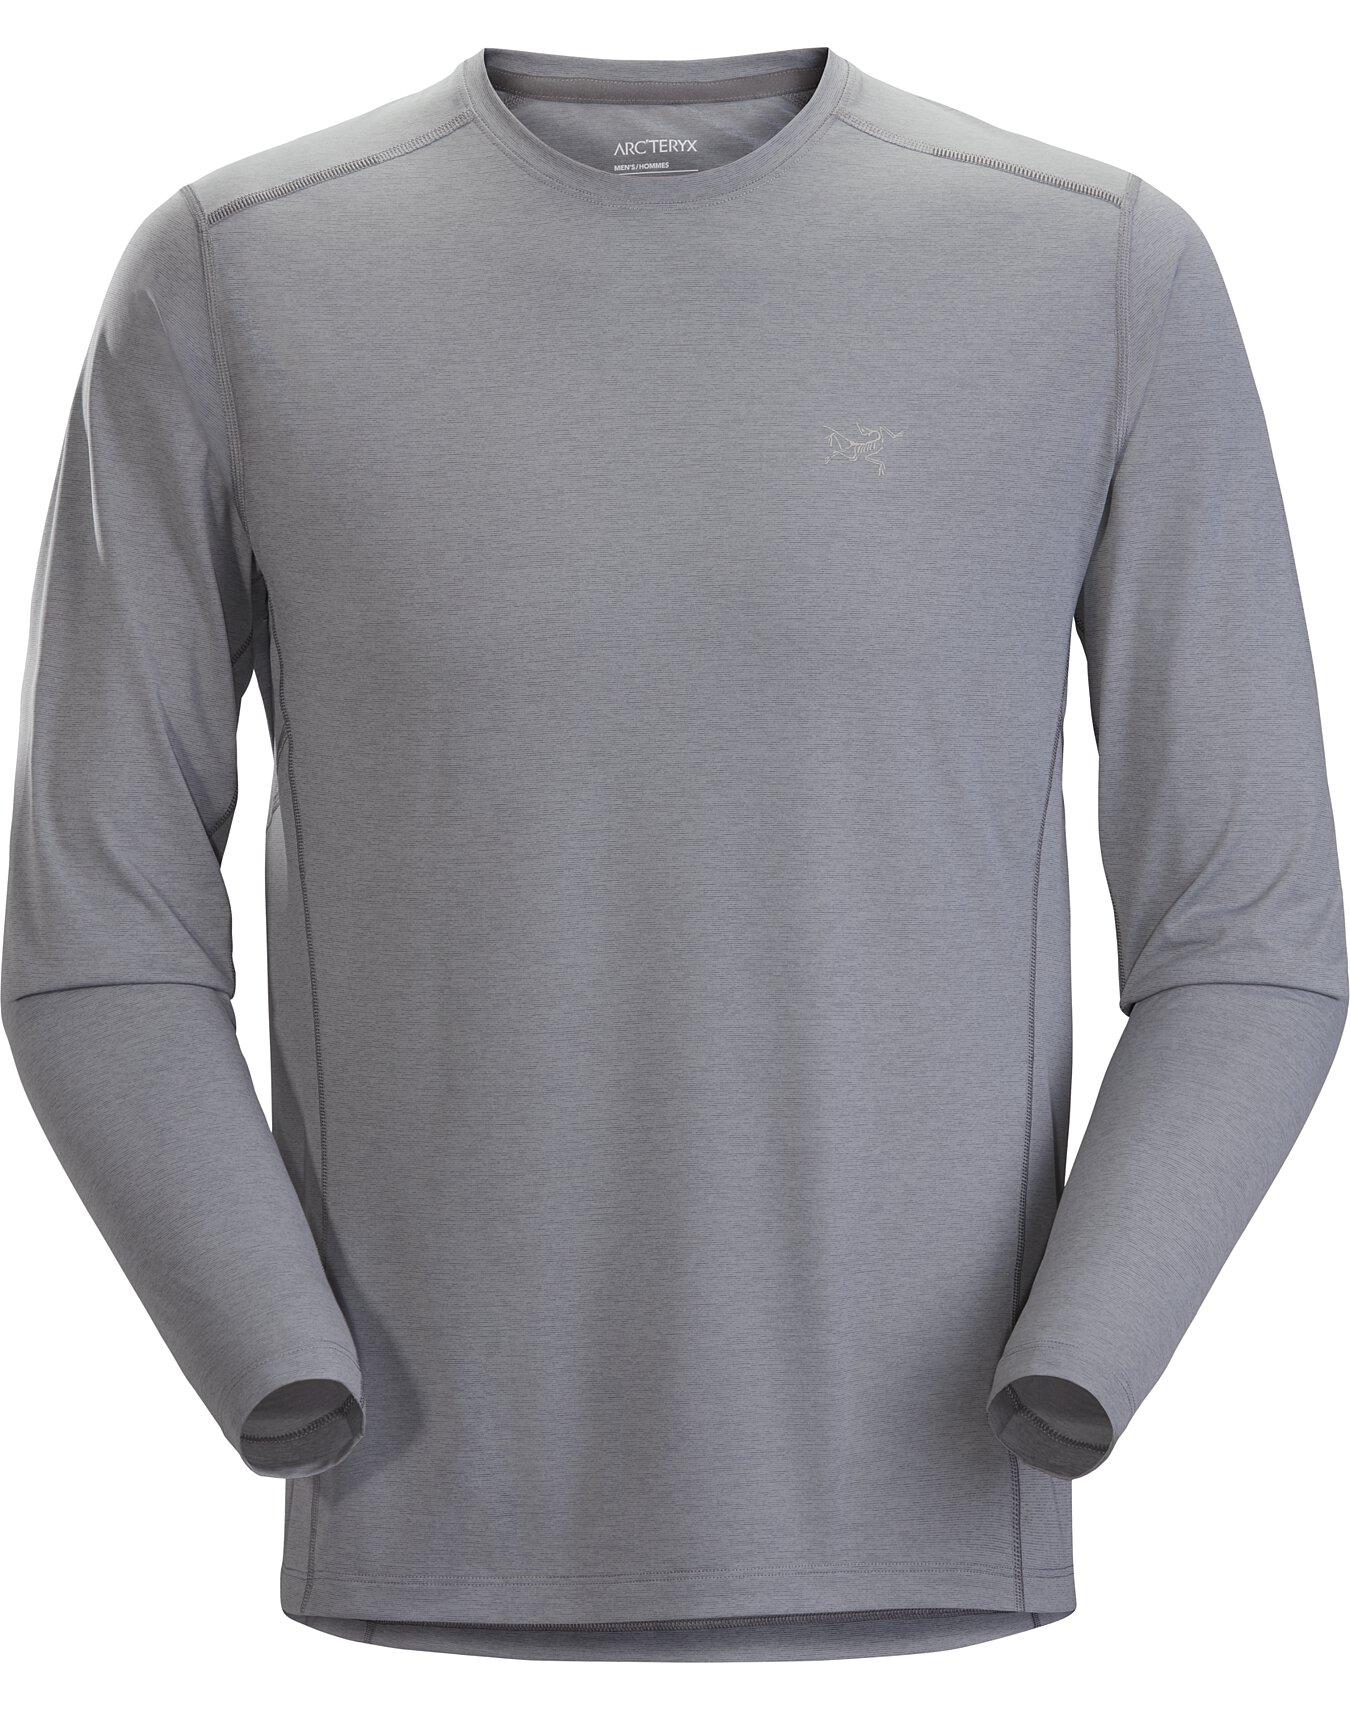 Motus SL Crew Neck Shirt LS Men's